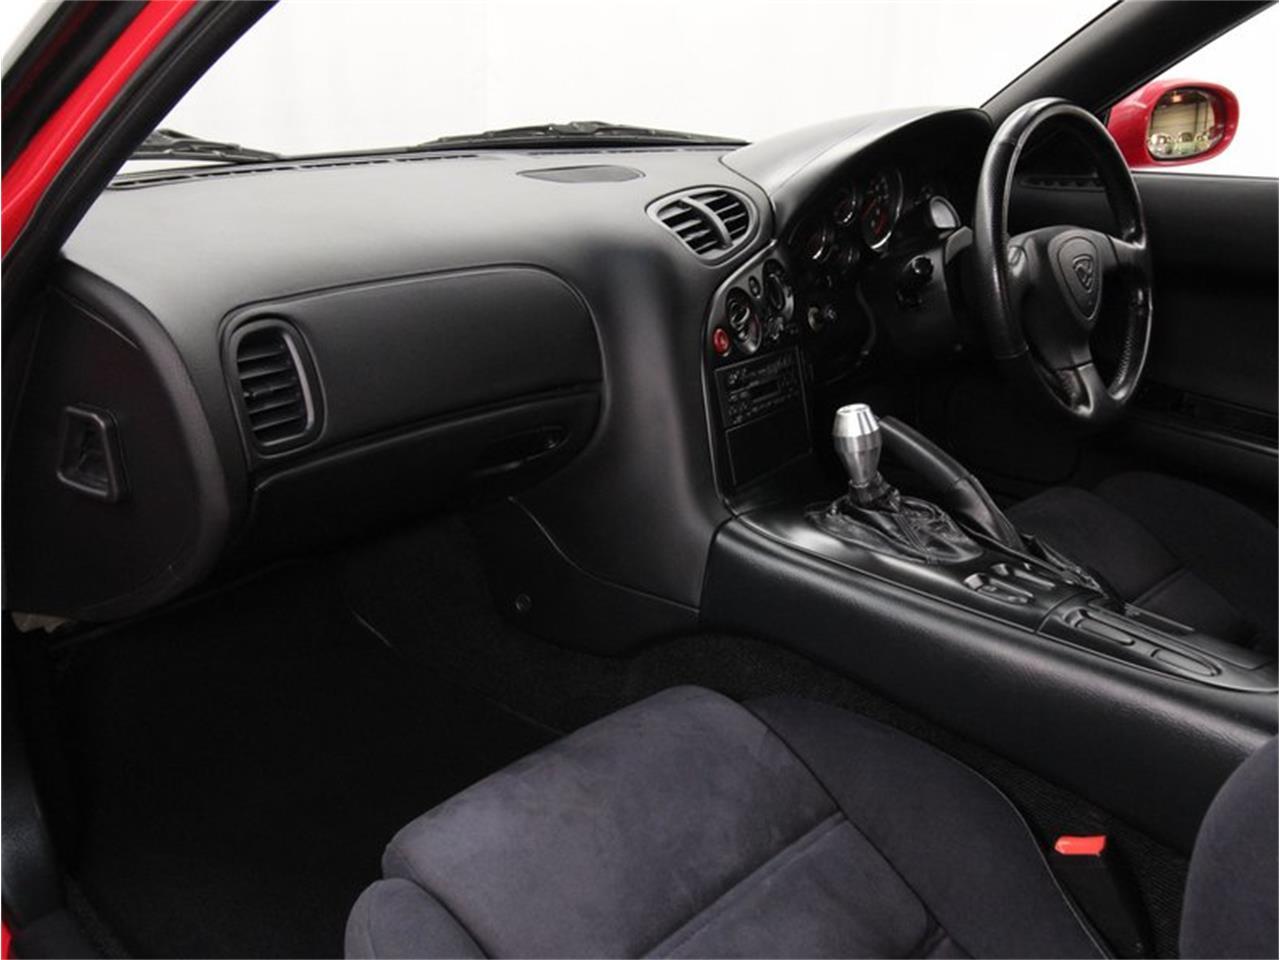 1993 Mazda RX-7 (CC-1416013) for sale in Christiansburg, Virginia